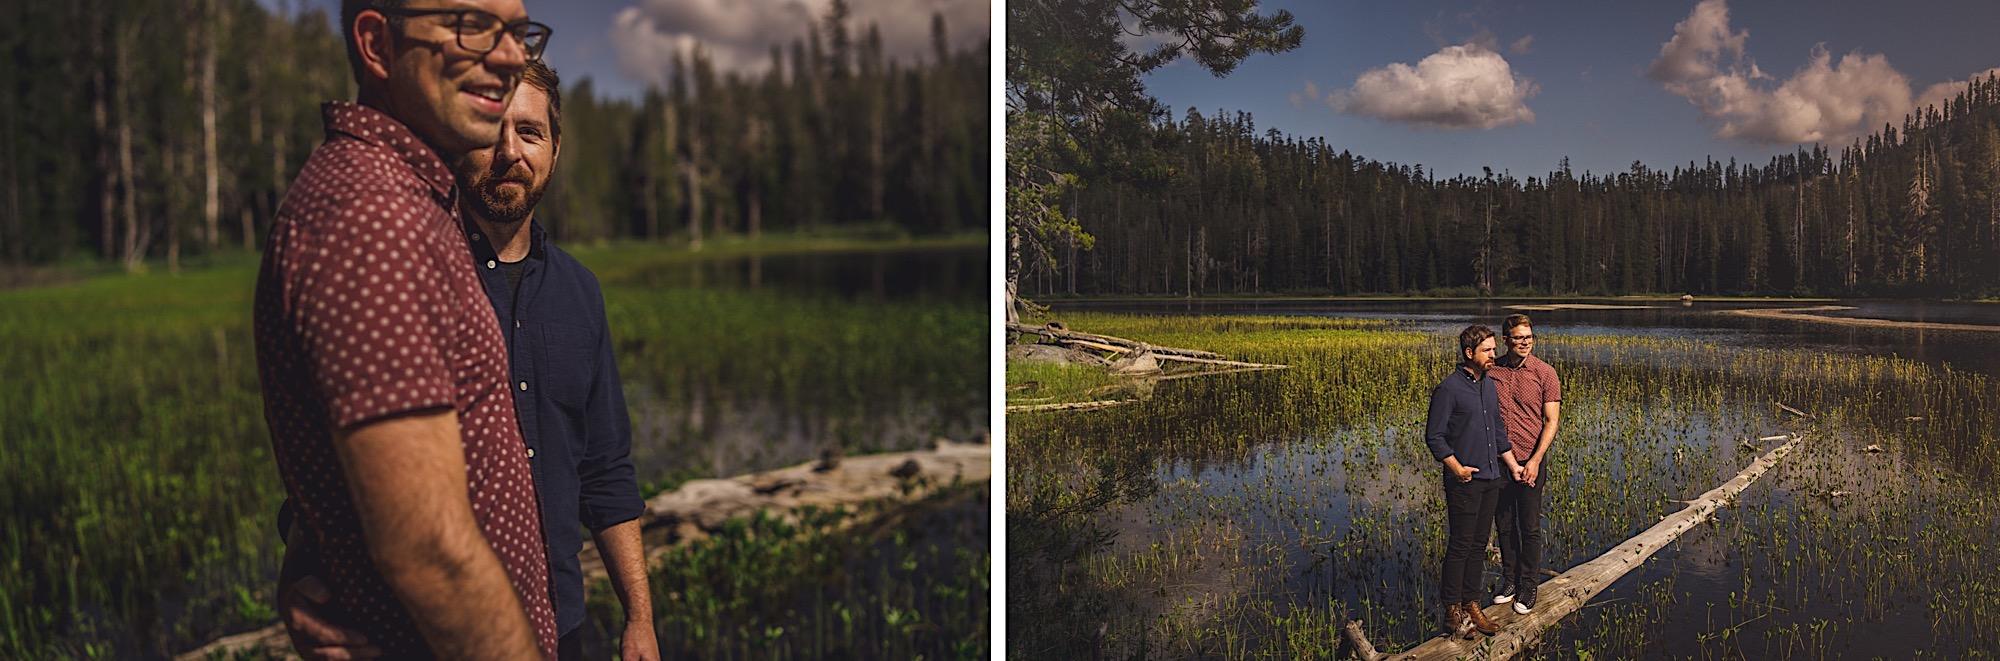 15_Emerald_Lake_photos.jpg